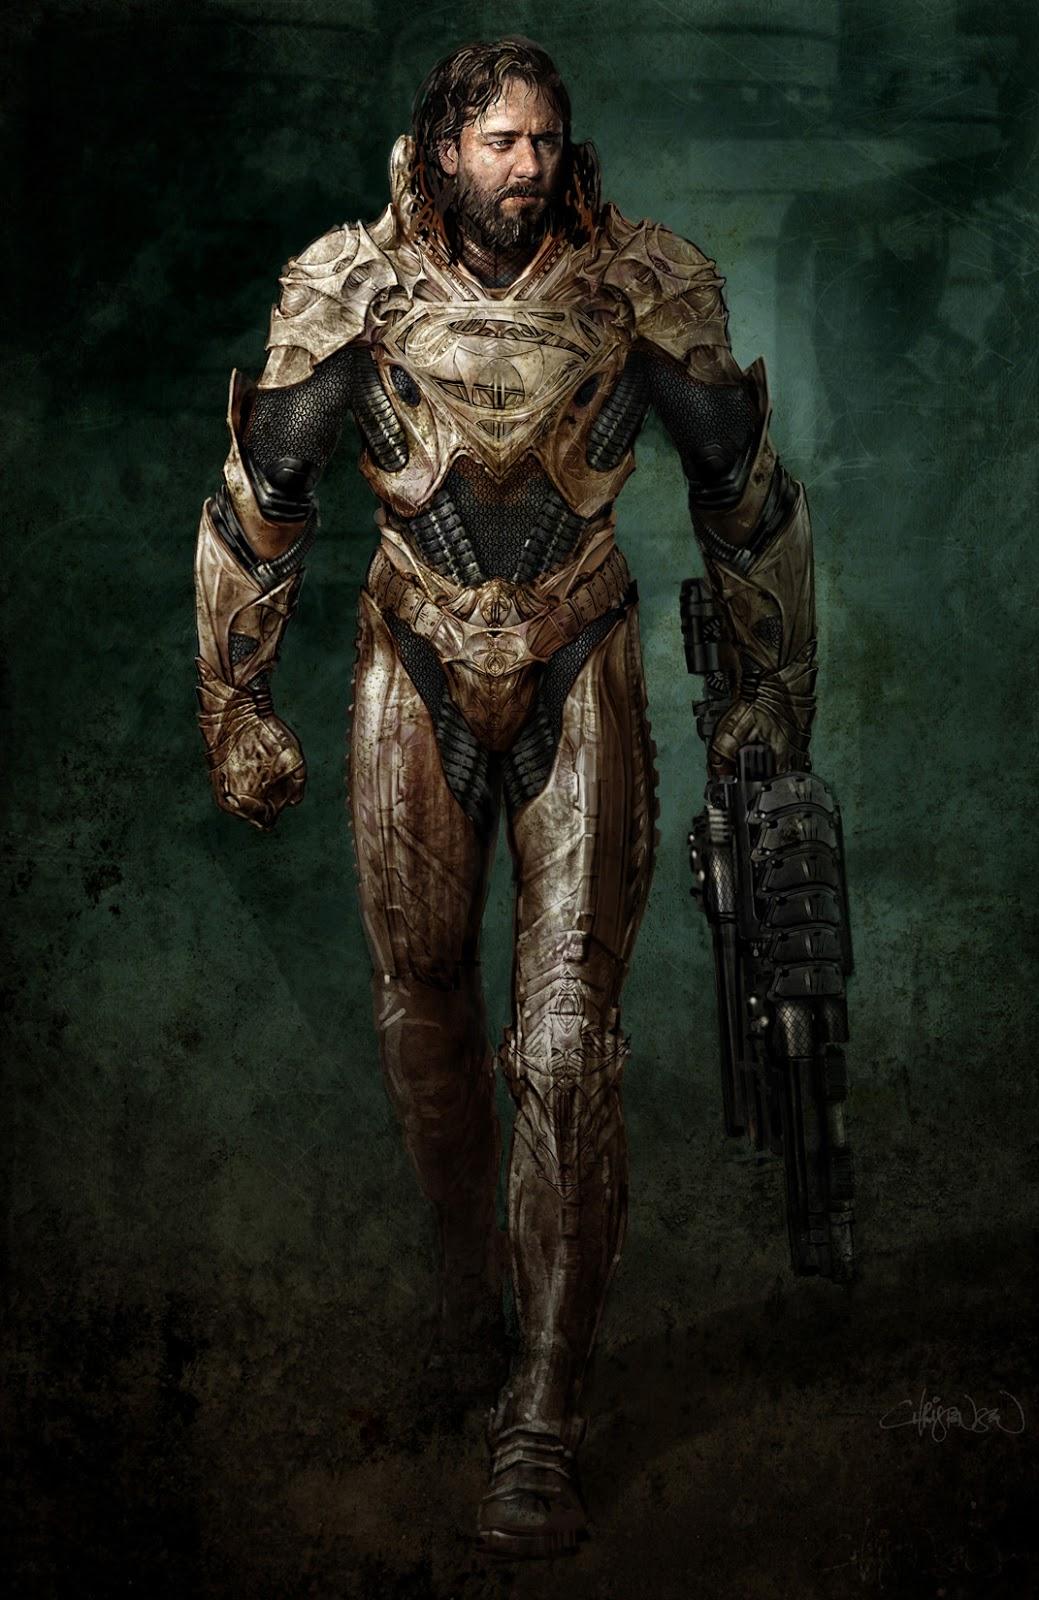 Jor Els Battle Armor DC Comics Extended Universe Wiki